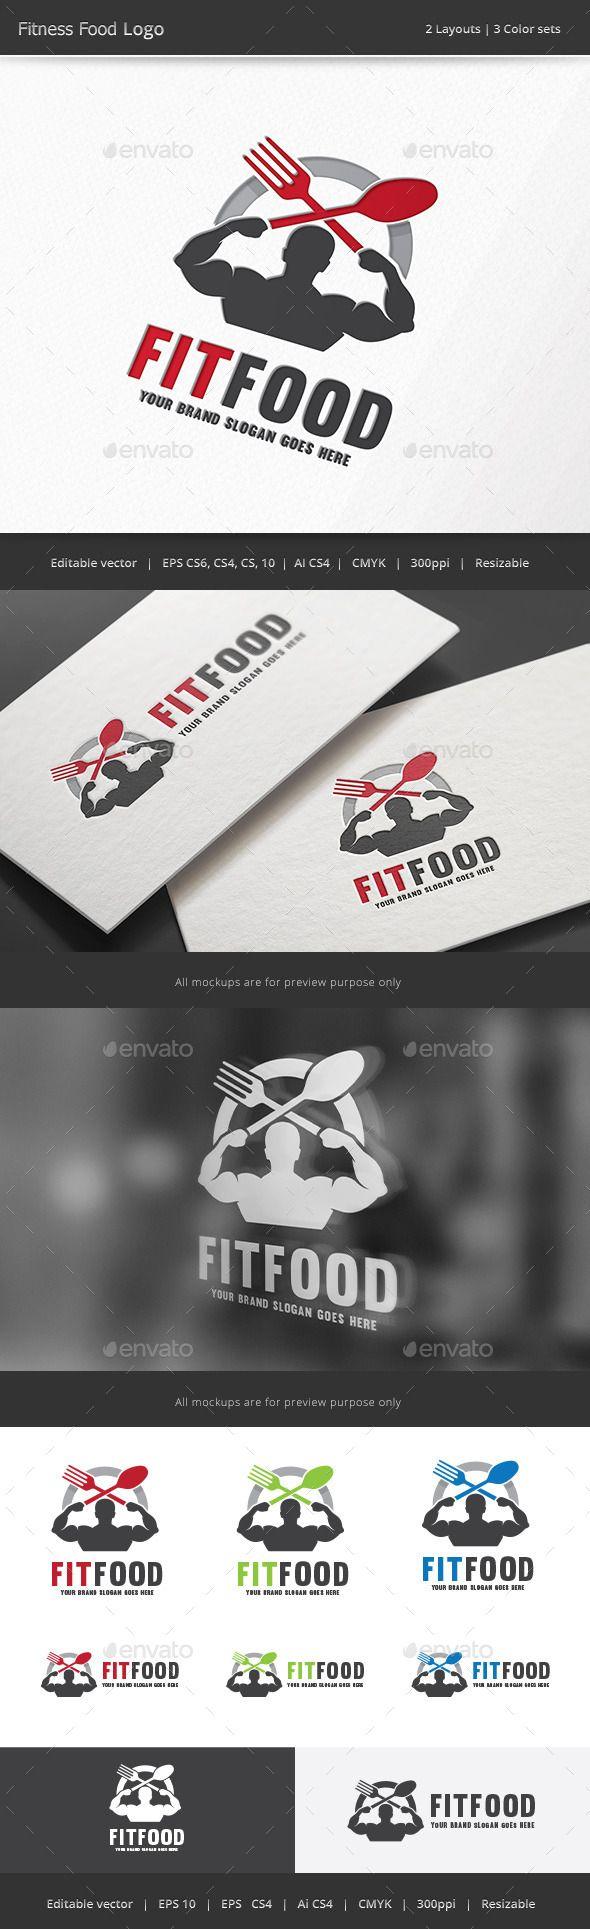 Fitness Food  Logo Design Template Vector #logotype Download it here: http://graphicriver.net/item/fitness-food-logo/12251238?s_rank=610?ref=nesto